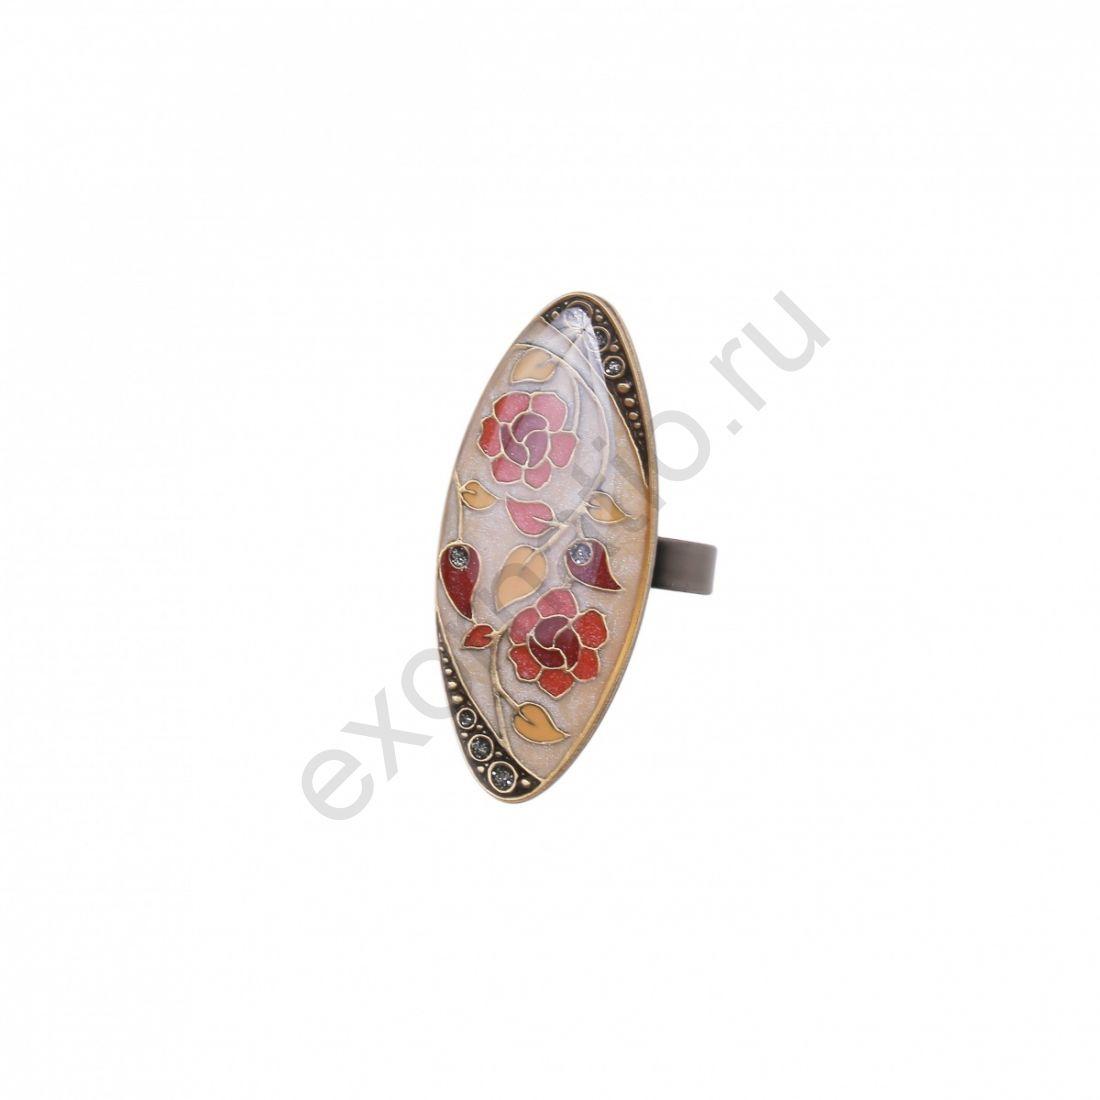 Кольцо Clara Bijoux K77112-2 BR